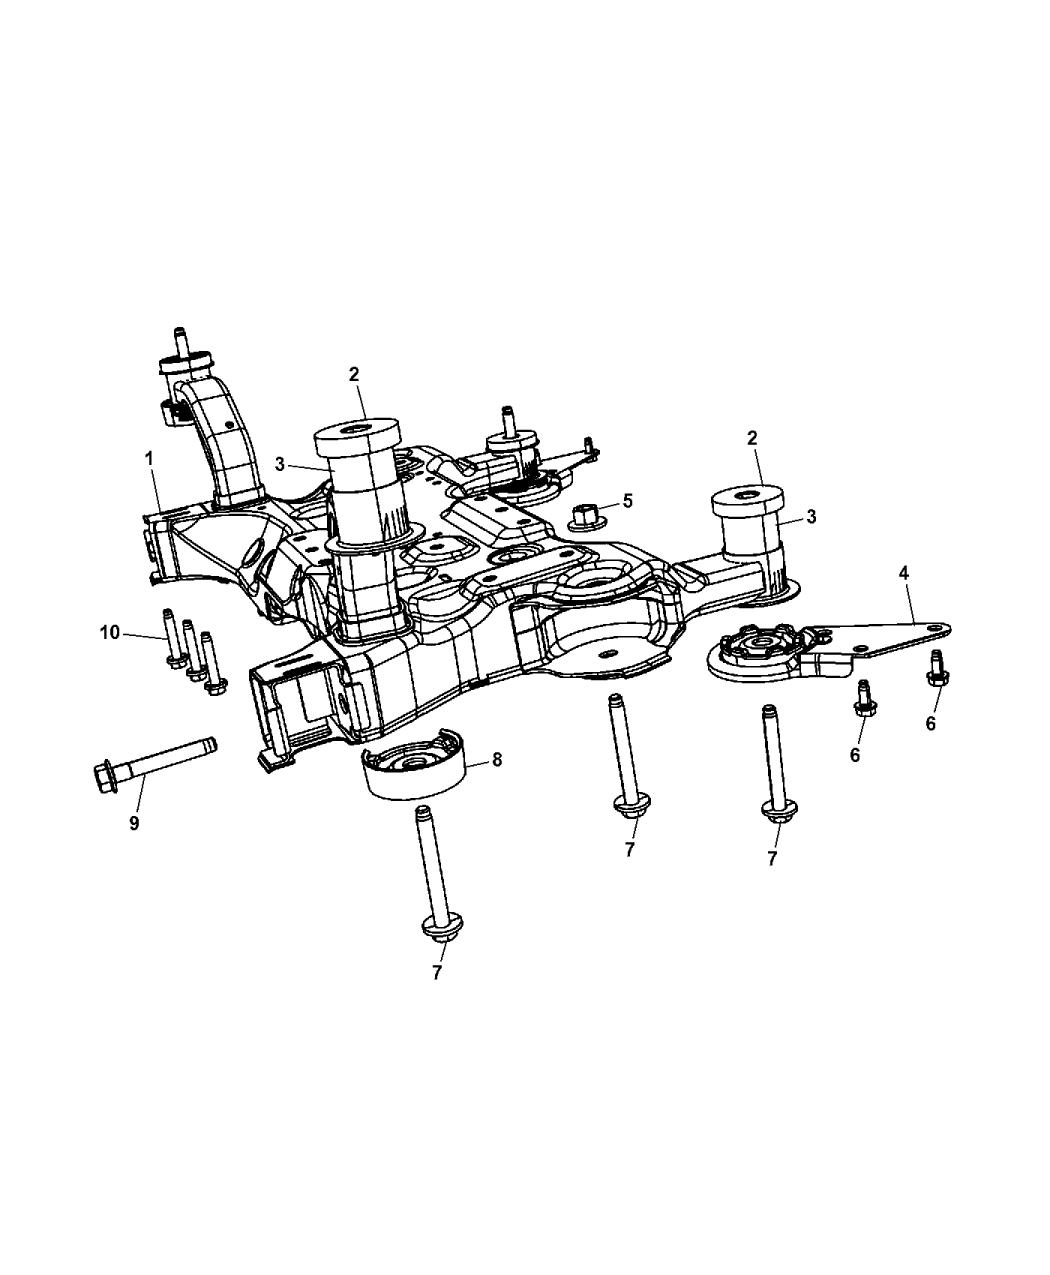 2014 Chrysler 200 Crossmember Front Suspension Fuse Box Diagram2014